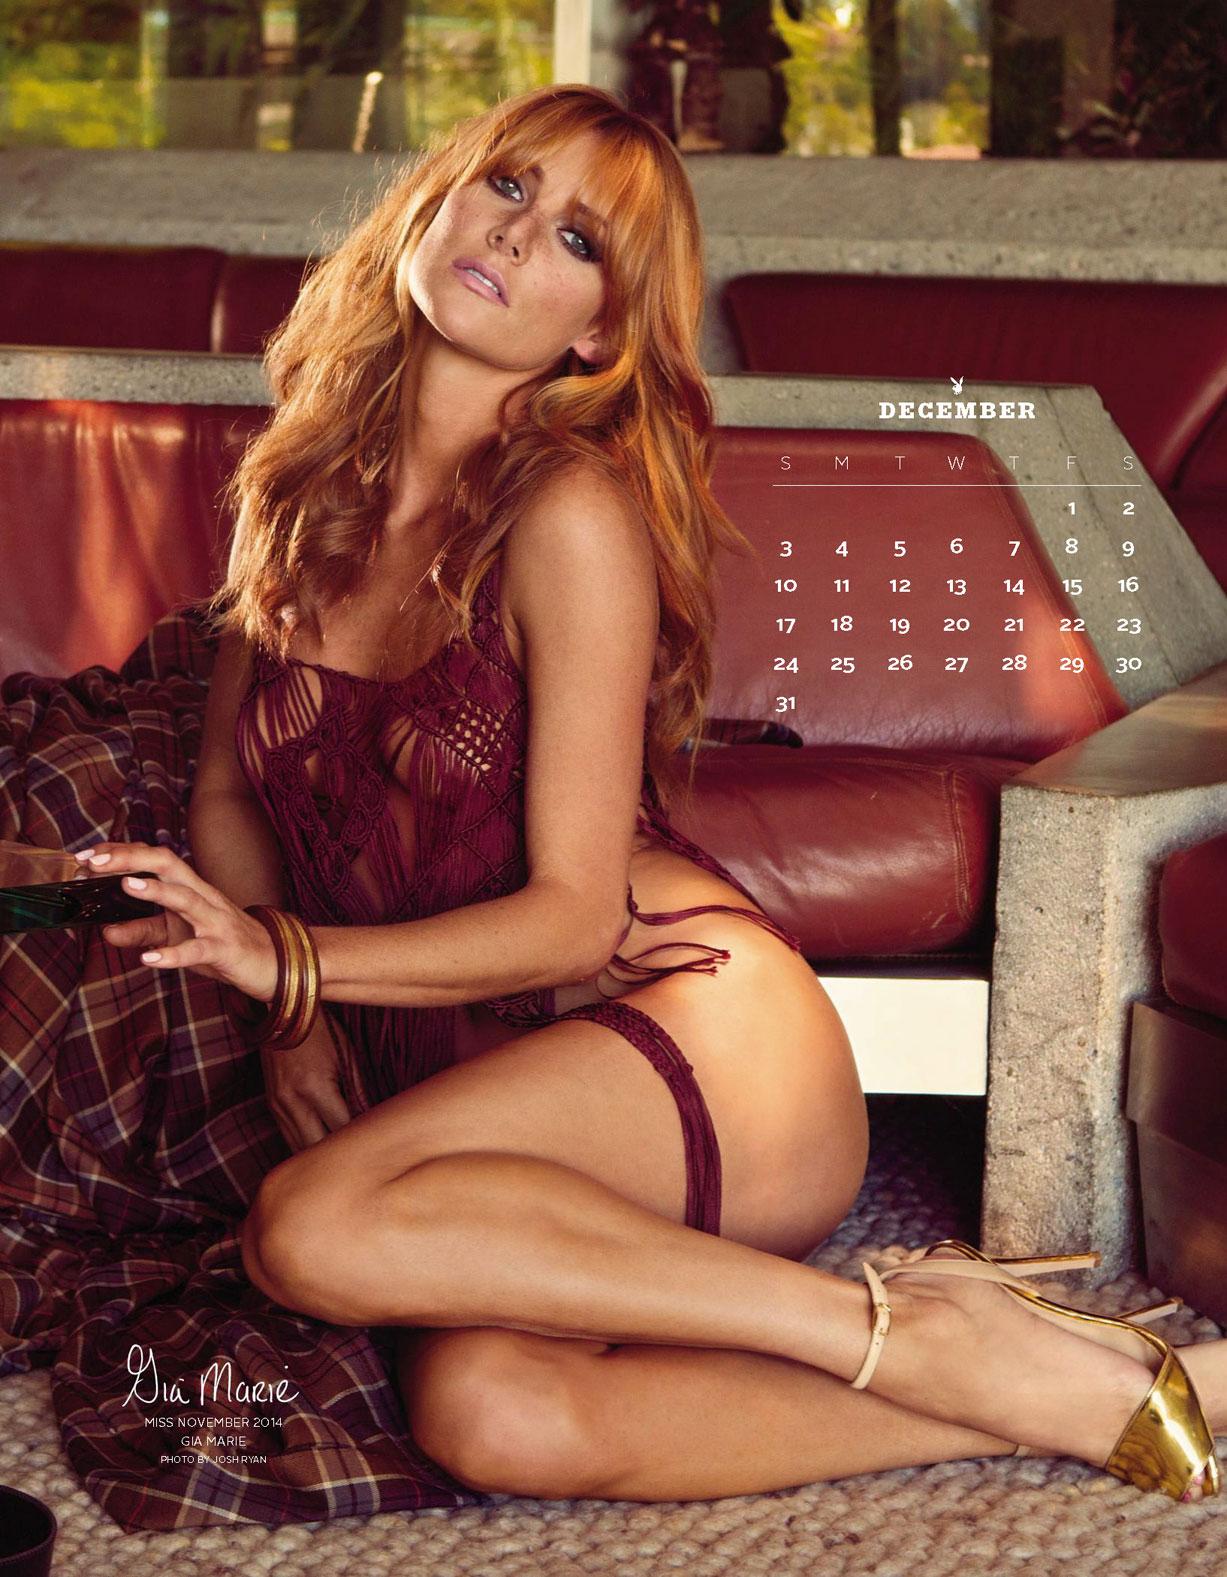 Playboy US Playmates 2017 calendar - Miss November 2014 Gia Marie / Джиа Мари – Девушка месяца ноябрь 2014 журнала Плейбой США